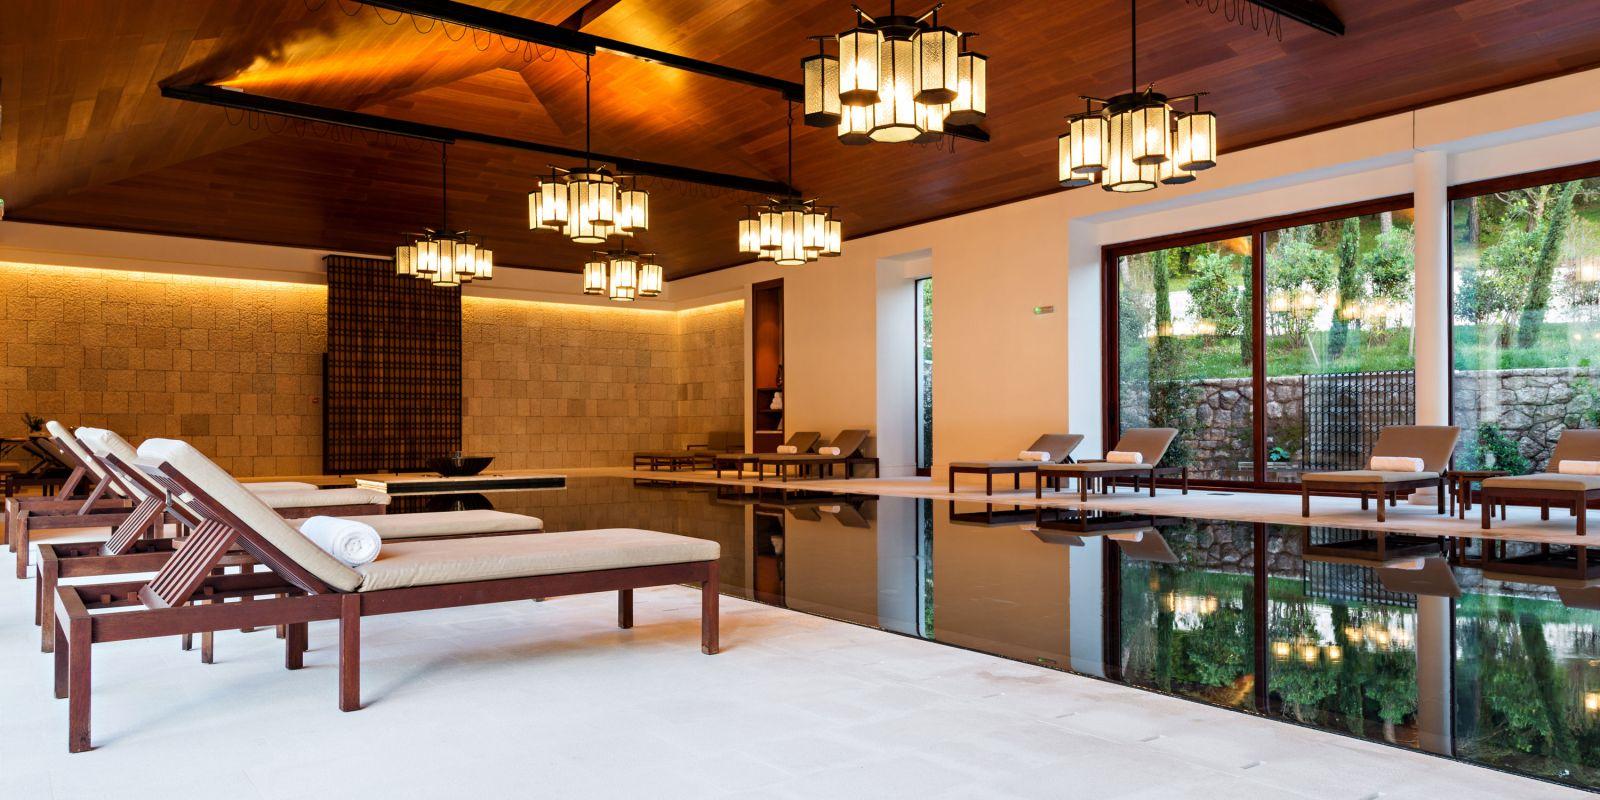 poolheizung, poolsanierung, swimmingpool, pool bauen | ac